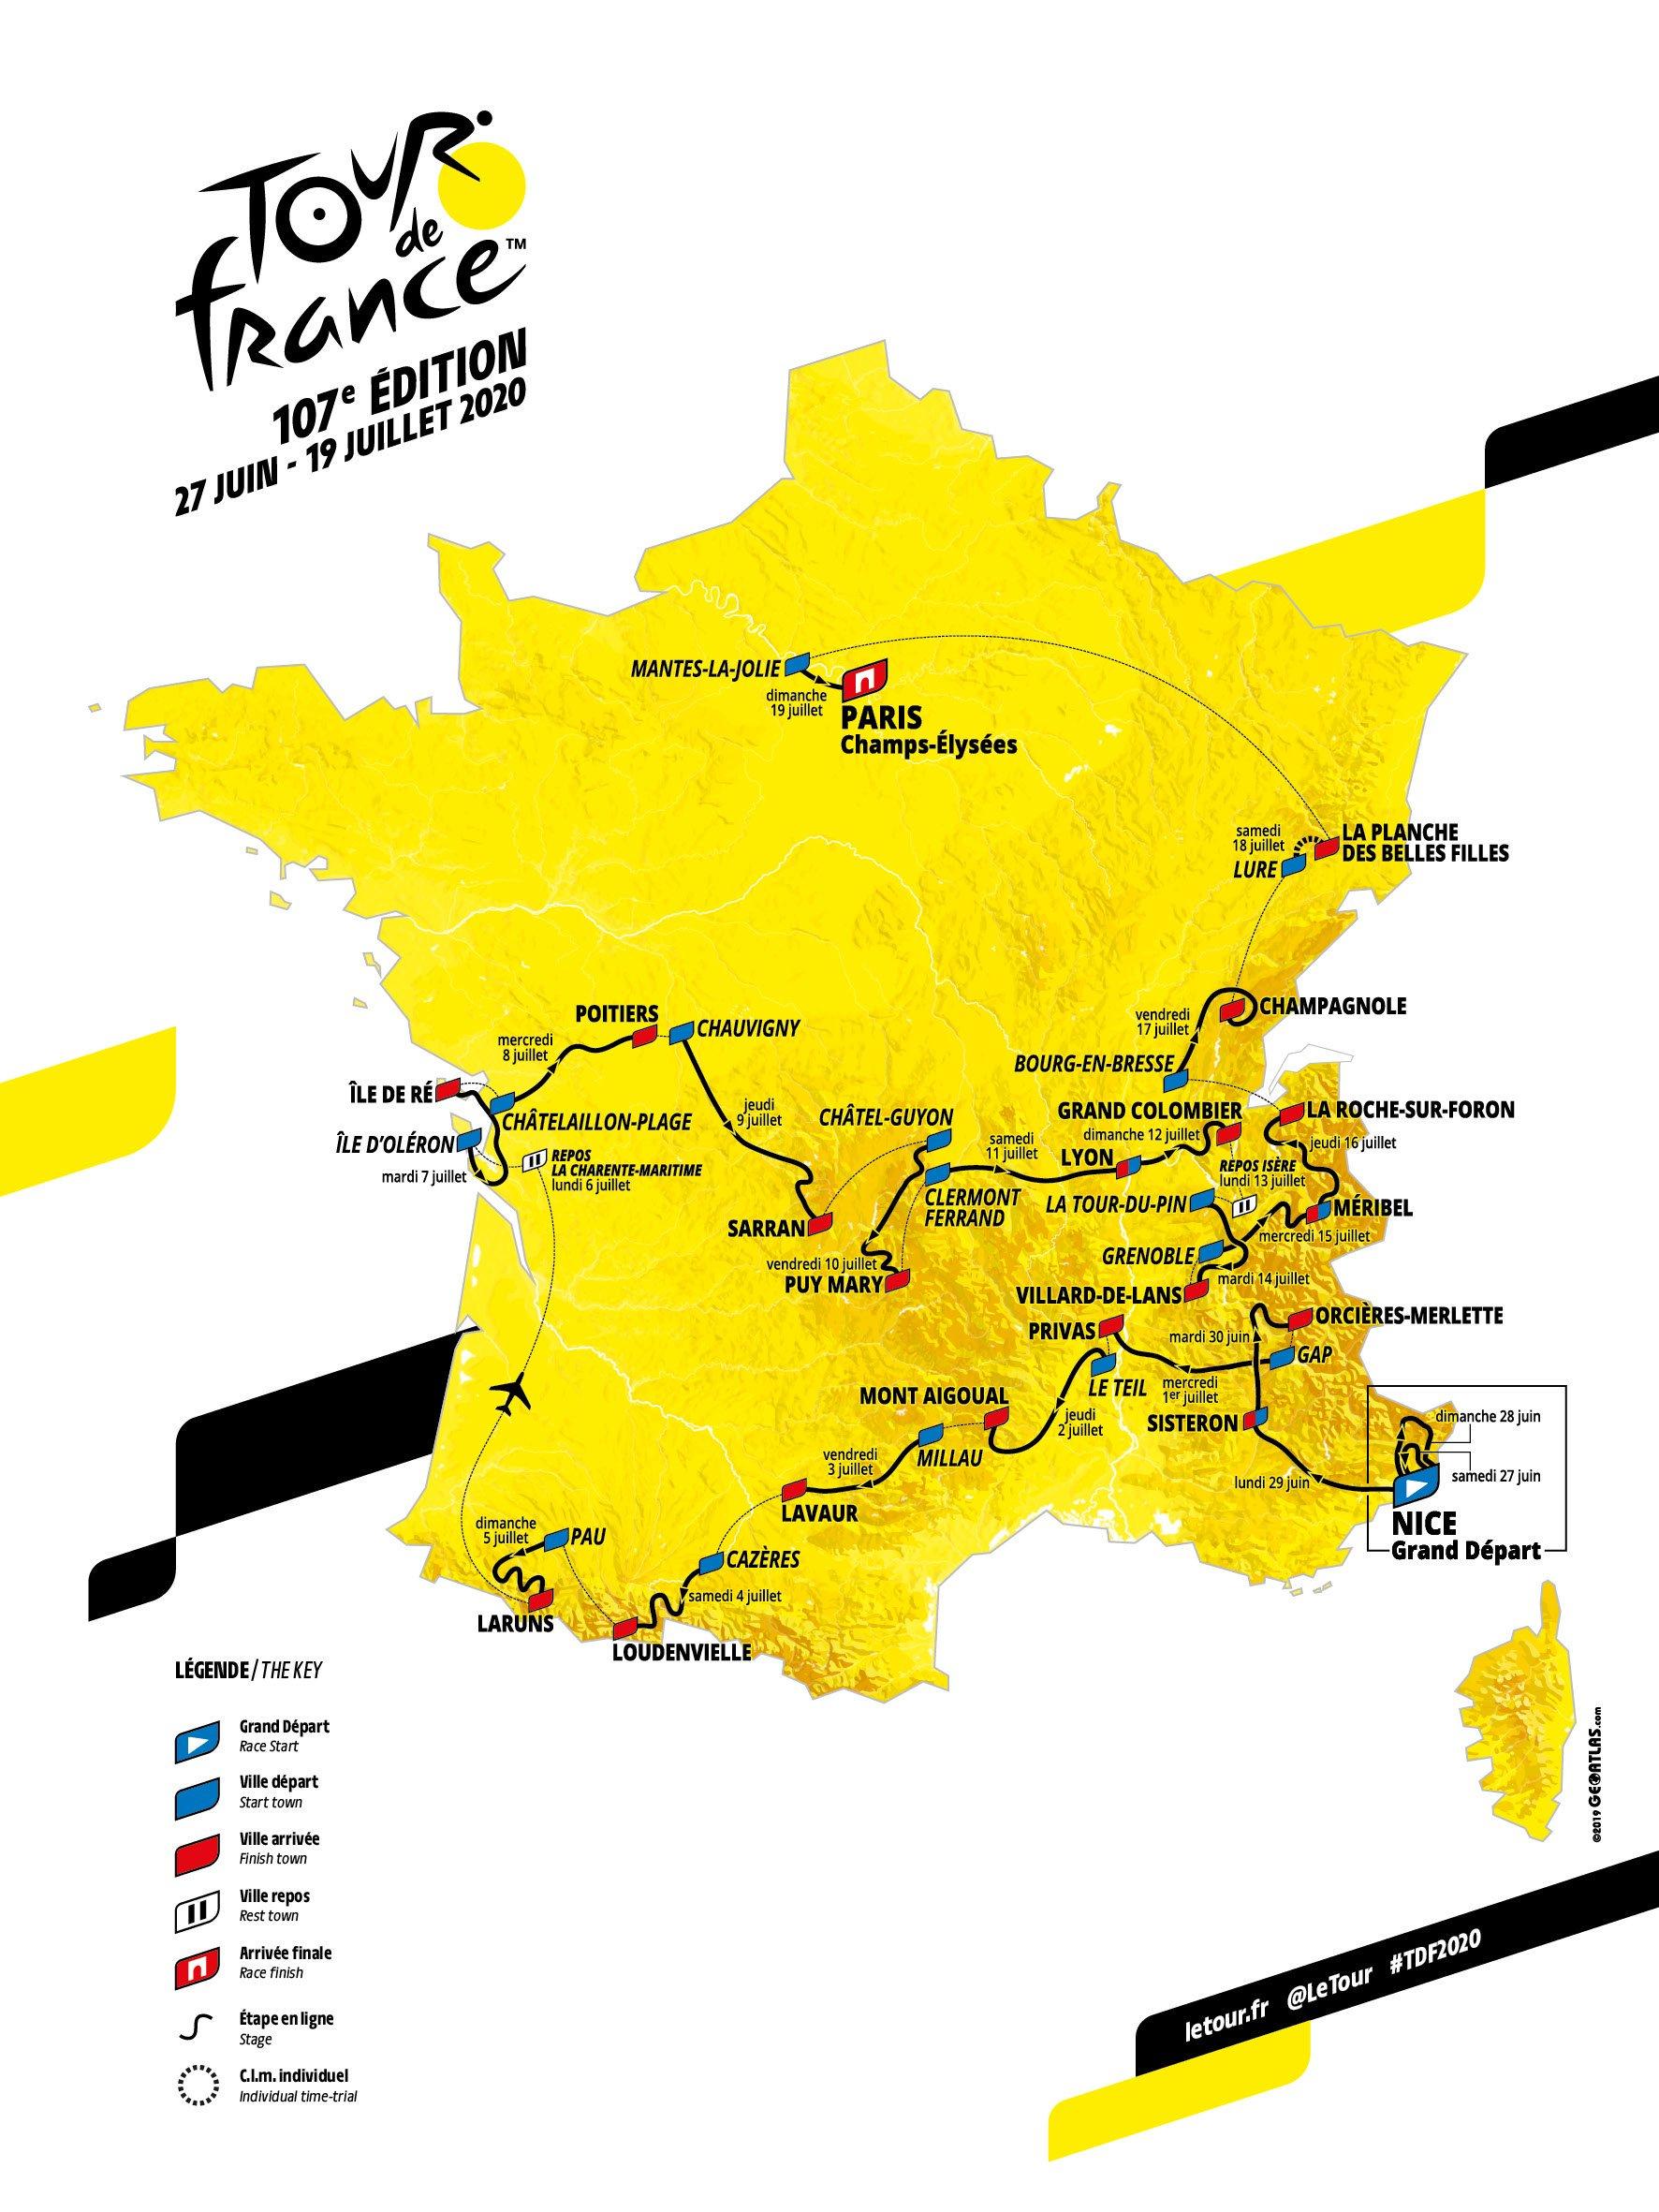 Tour De France 2020 Route Revealed | Cyclingnews concernant Grande Carte De France